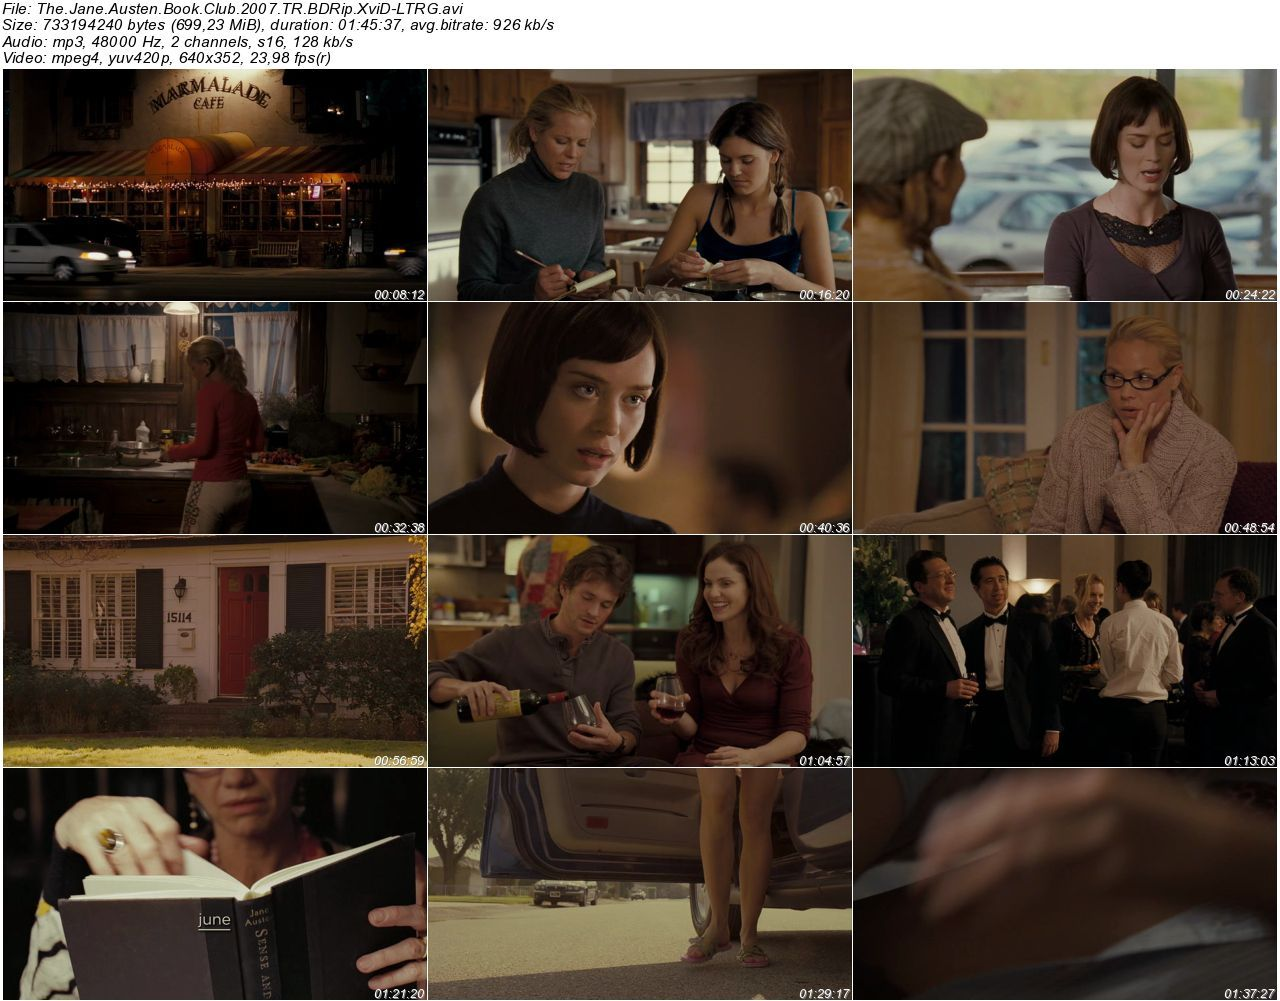 The Jane Austen Book Club - 2007 BDRip XviD - Türkçe Dublaj Tek Link indir